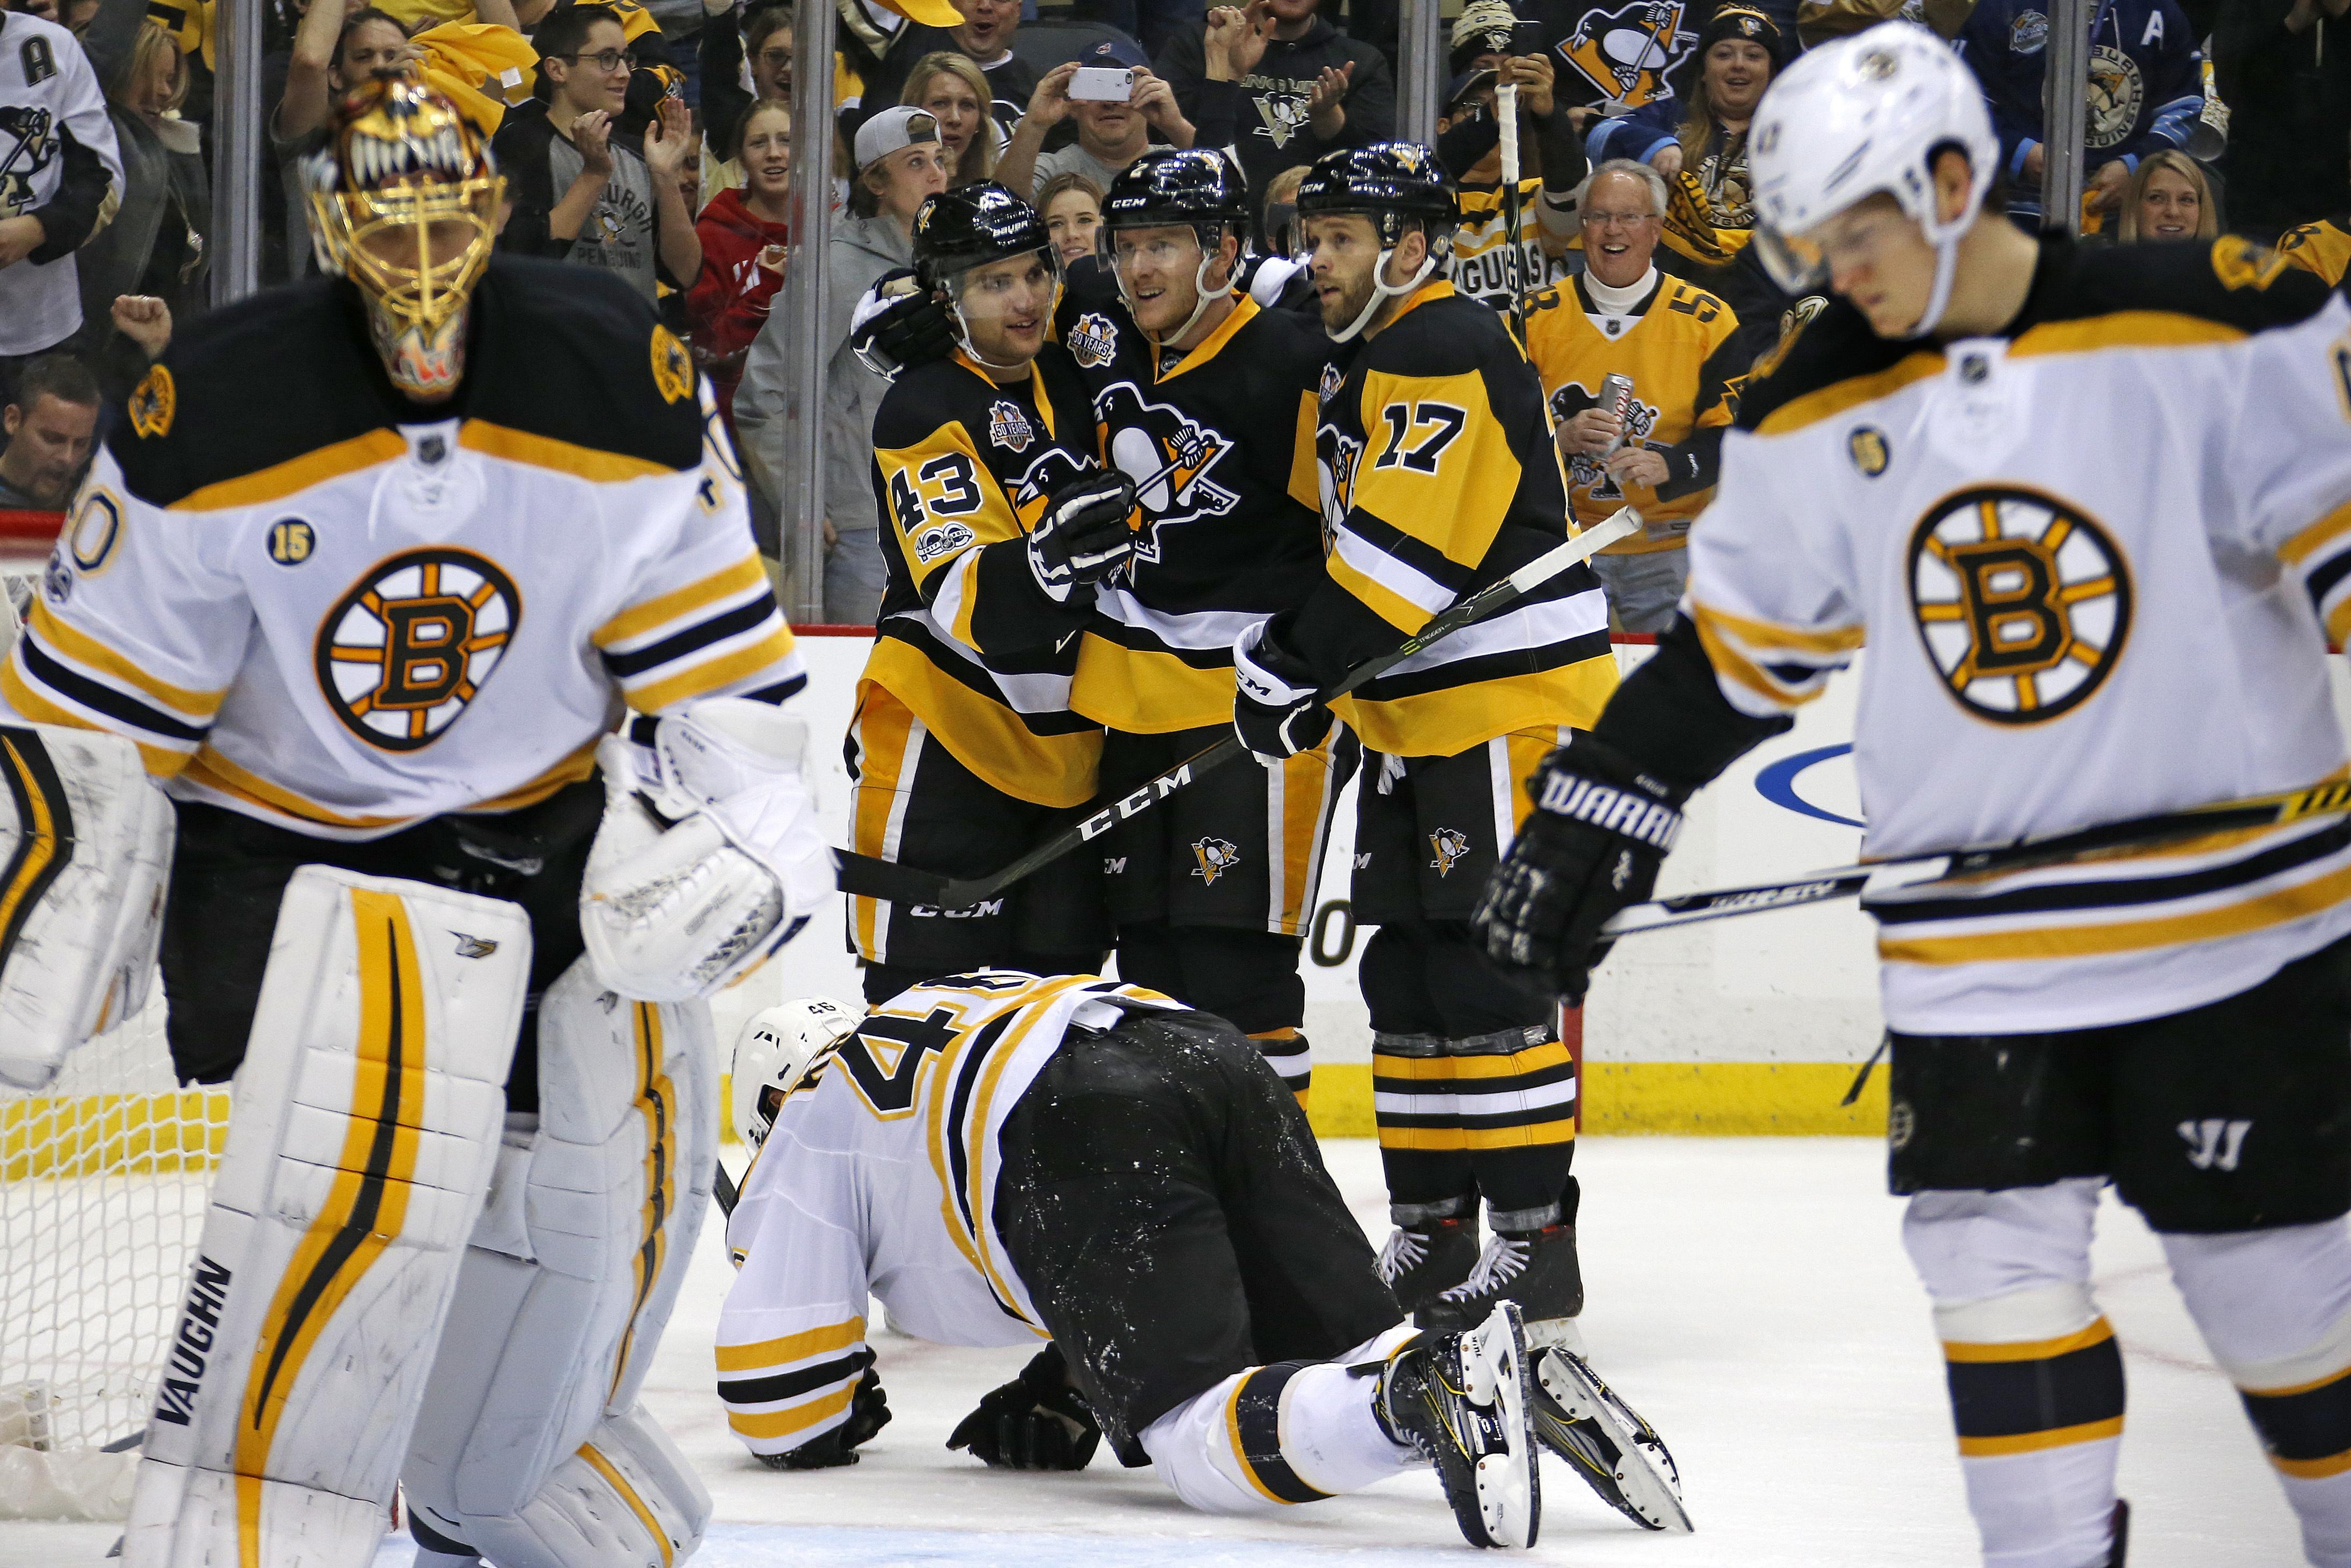 Bruins_penguins_hockey_67886